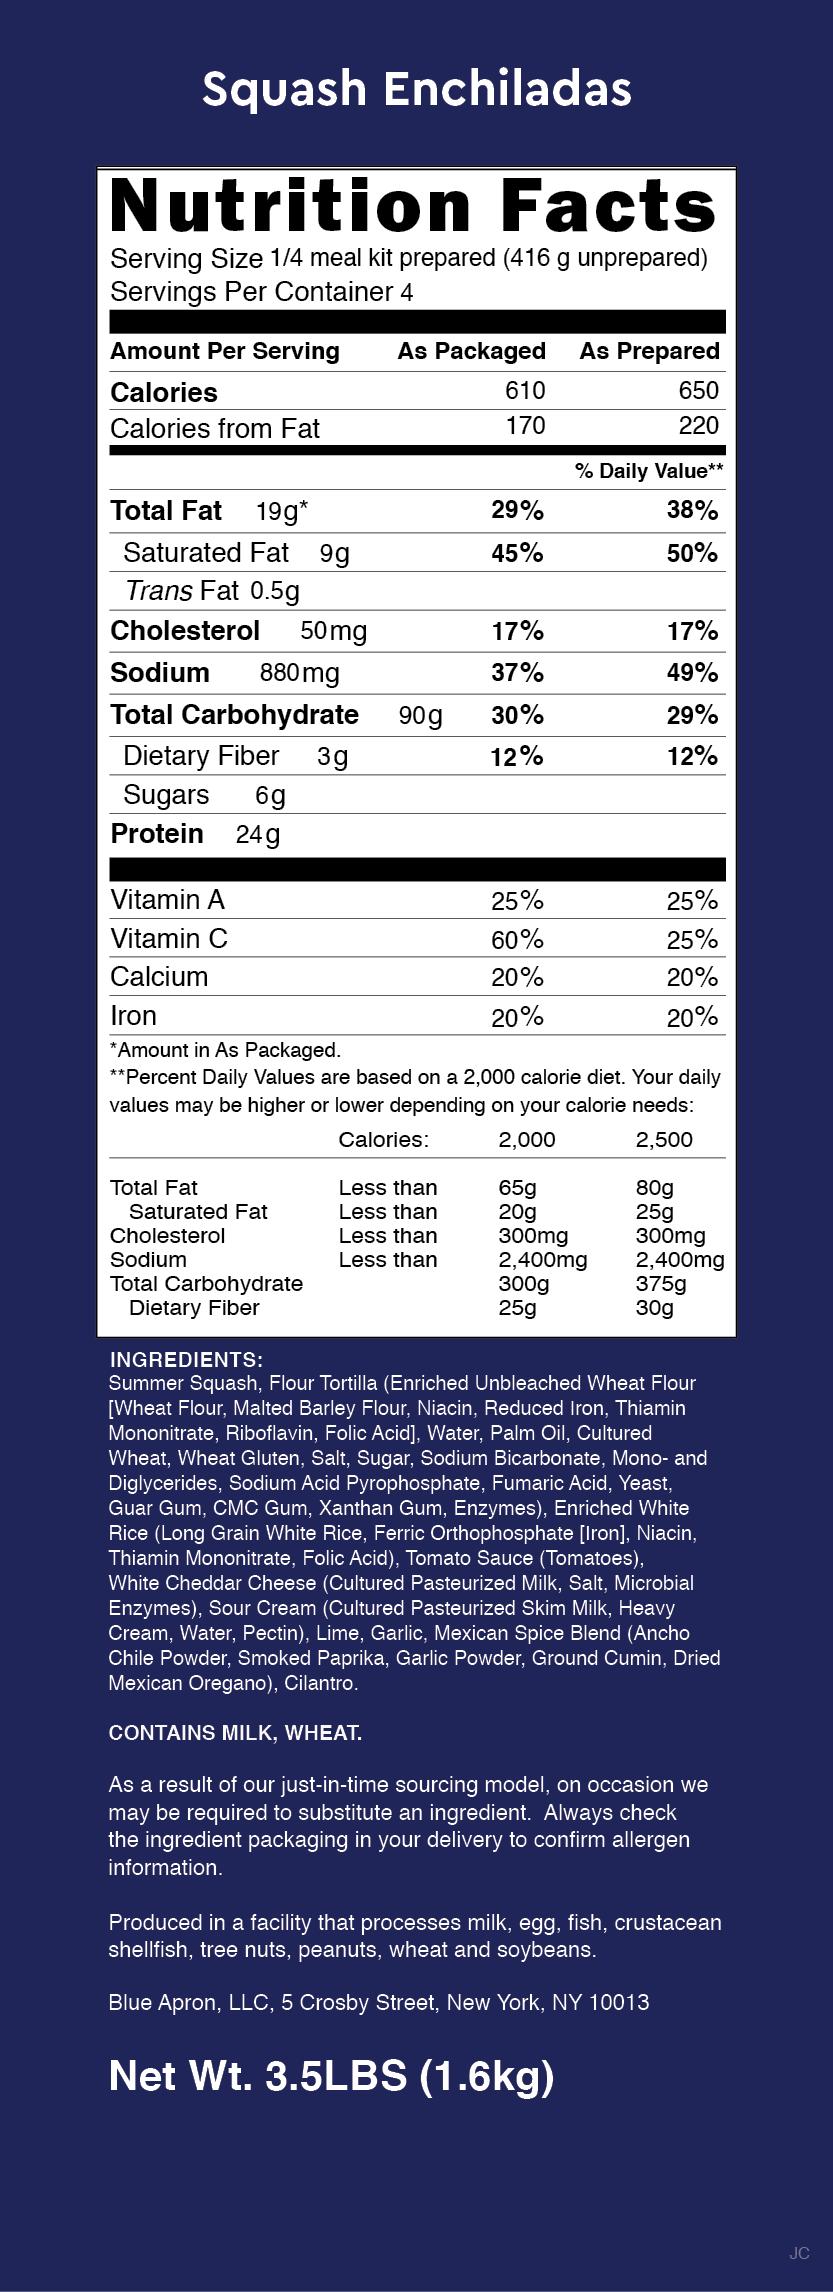 Blue apron zucchini enchilada - Nutrition Label